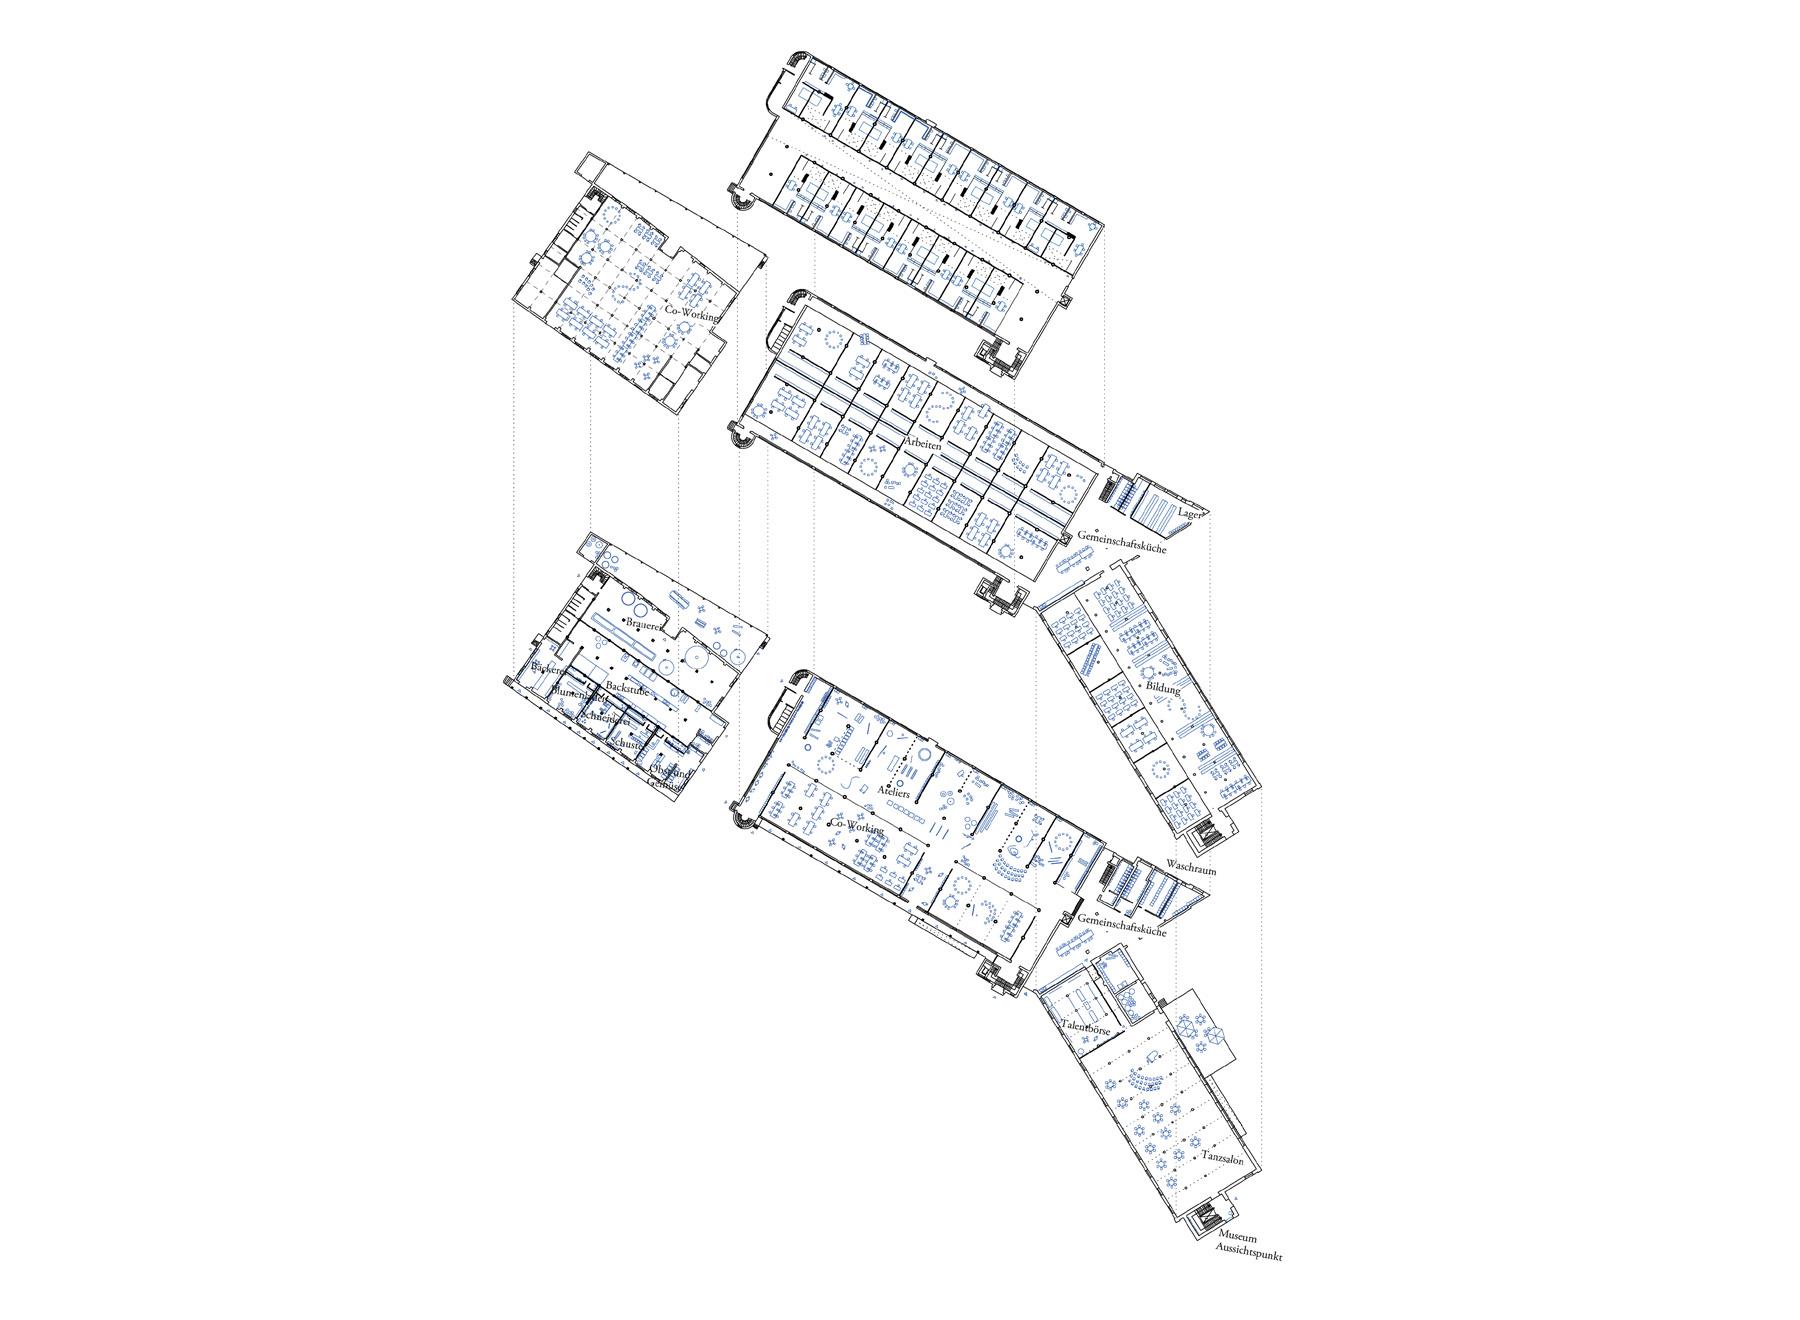 floor plans for Eduardstr. 41 and 43